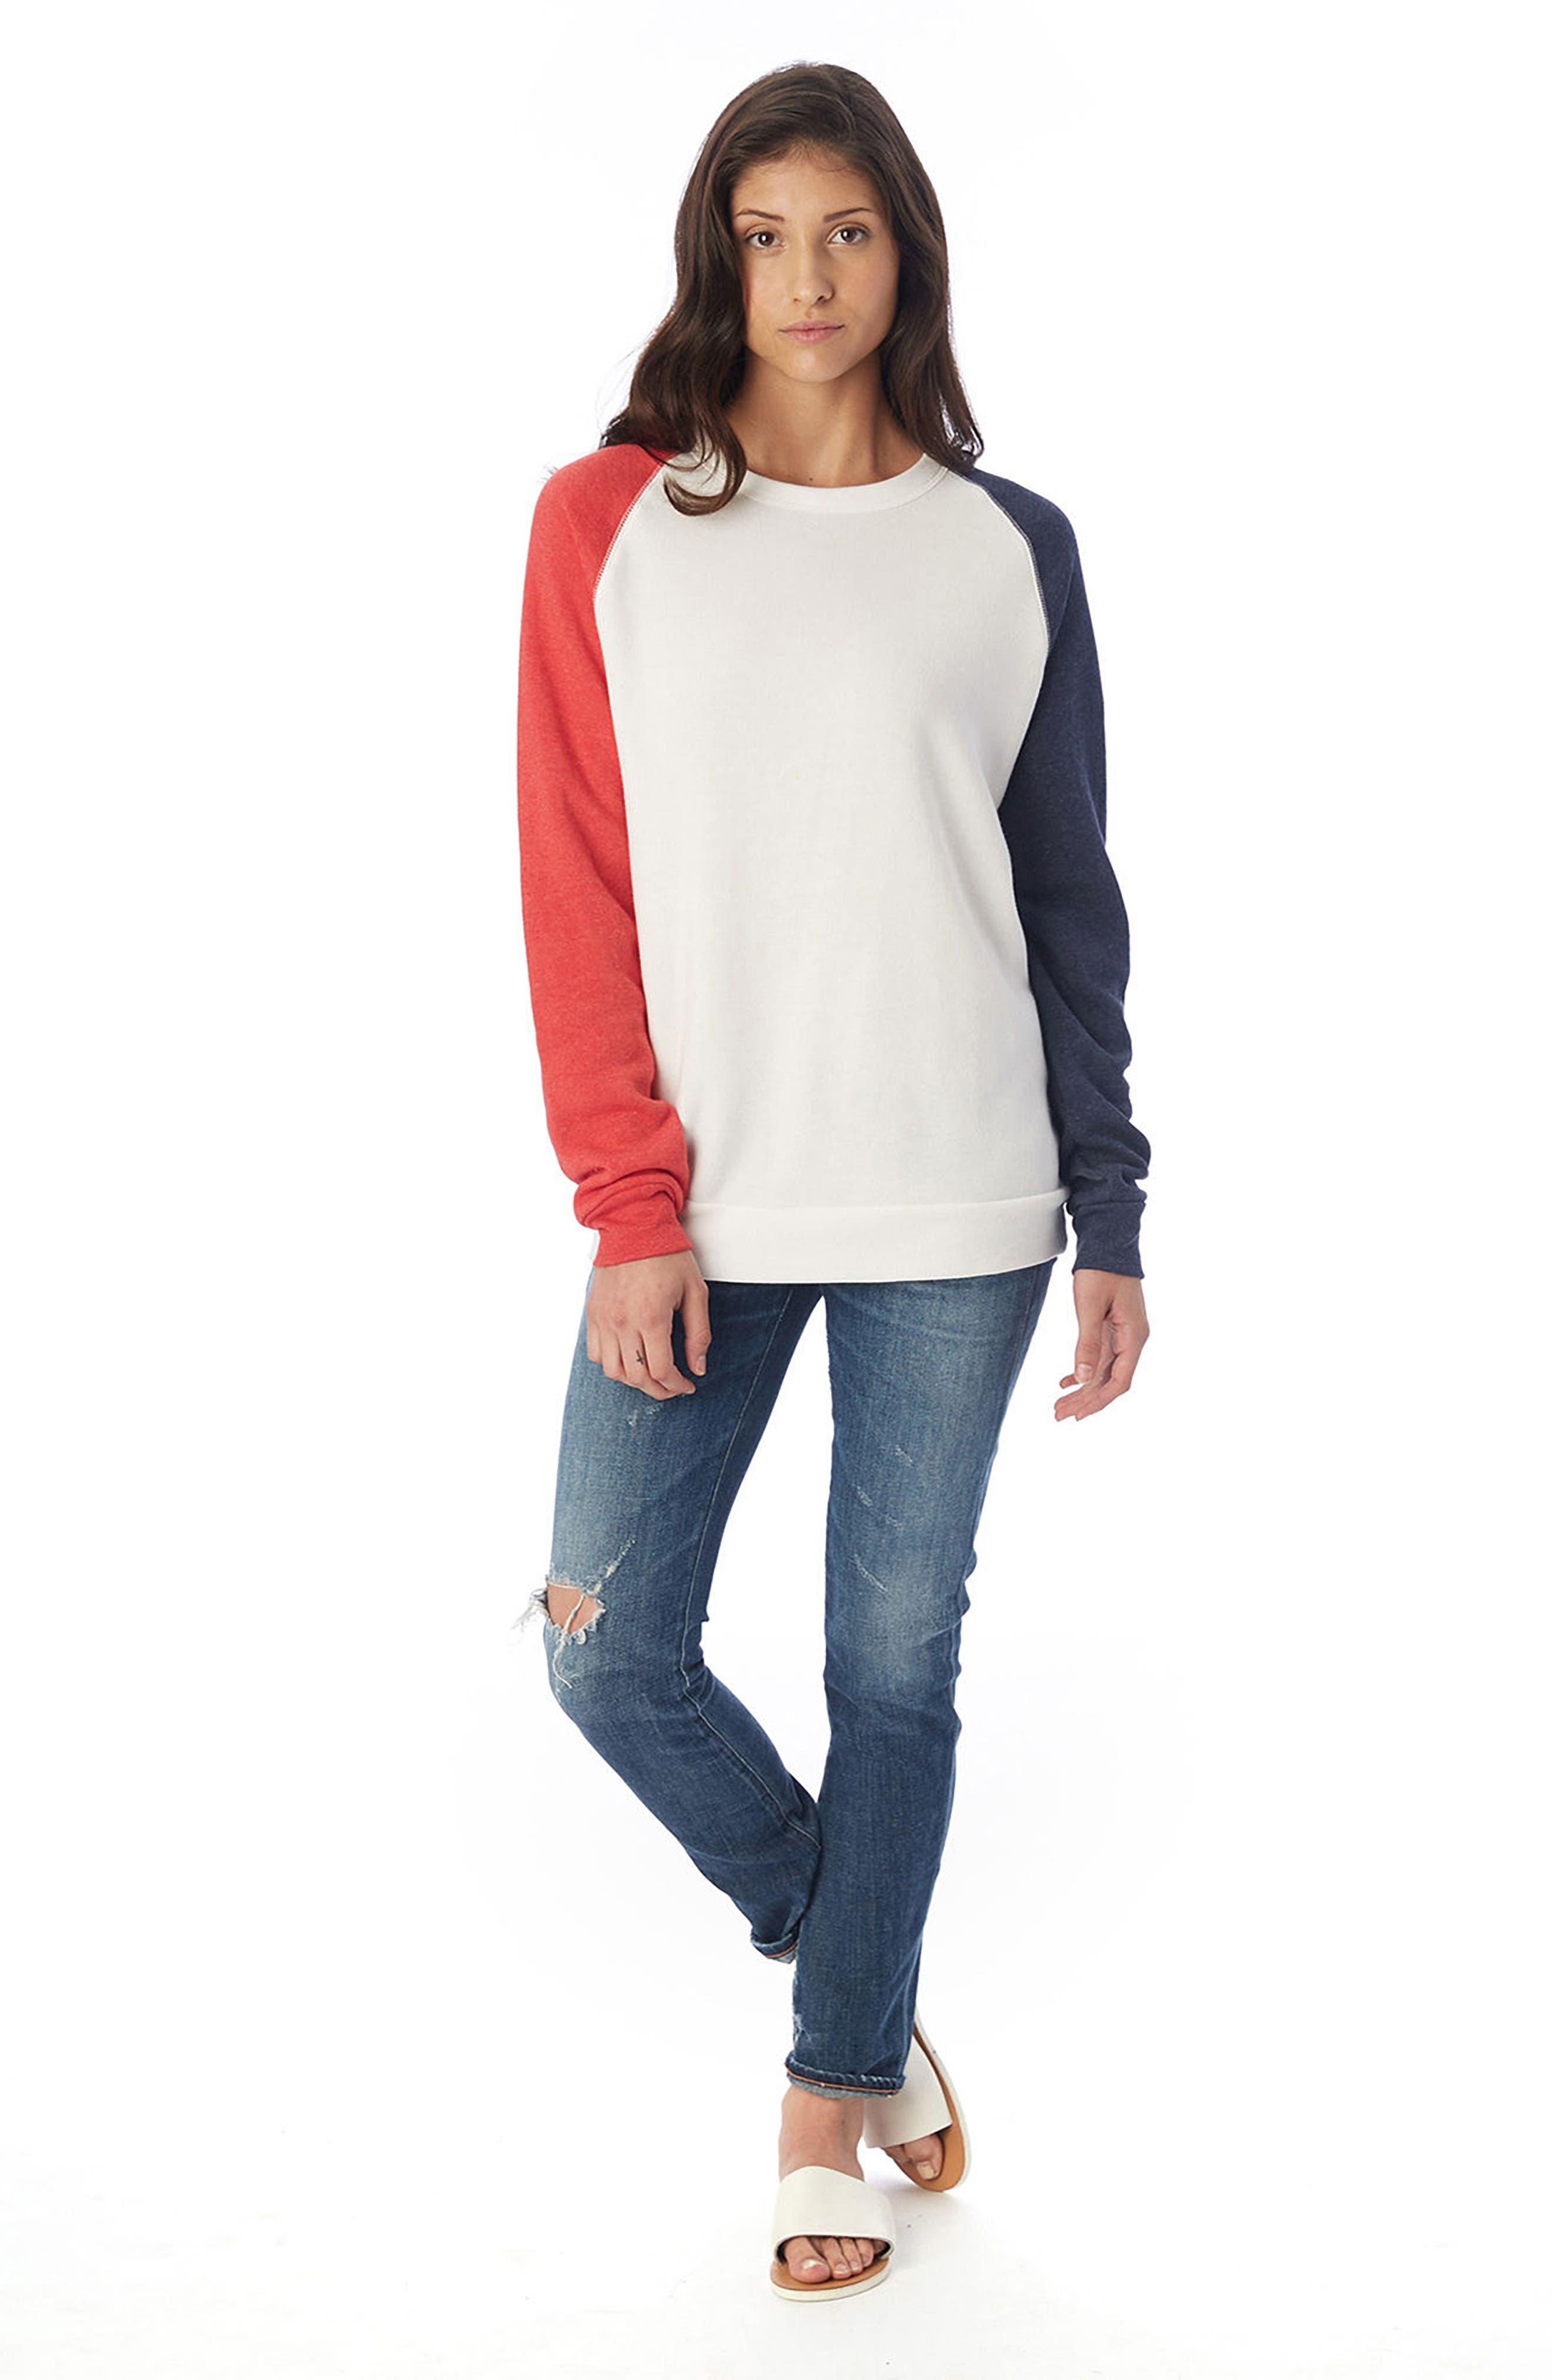 USA Champ Sweatshirt,                             Alternate thumbnail 4, color,                             Ivory/ True Red/ True Navy